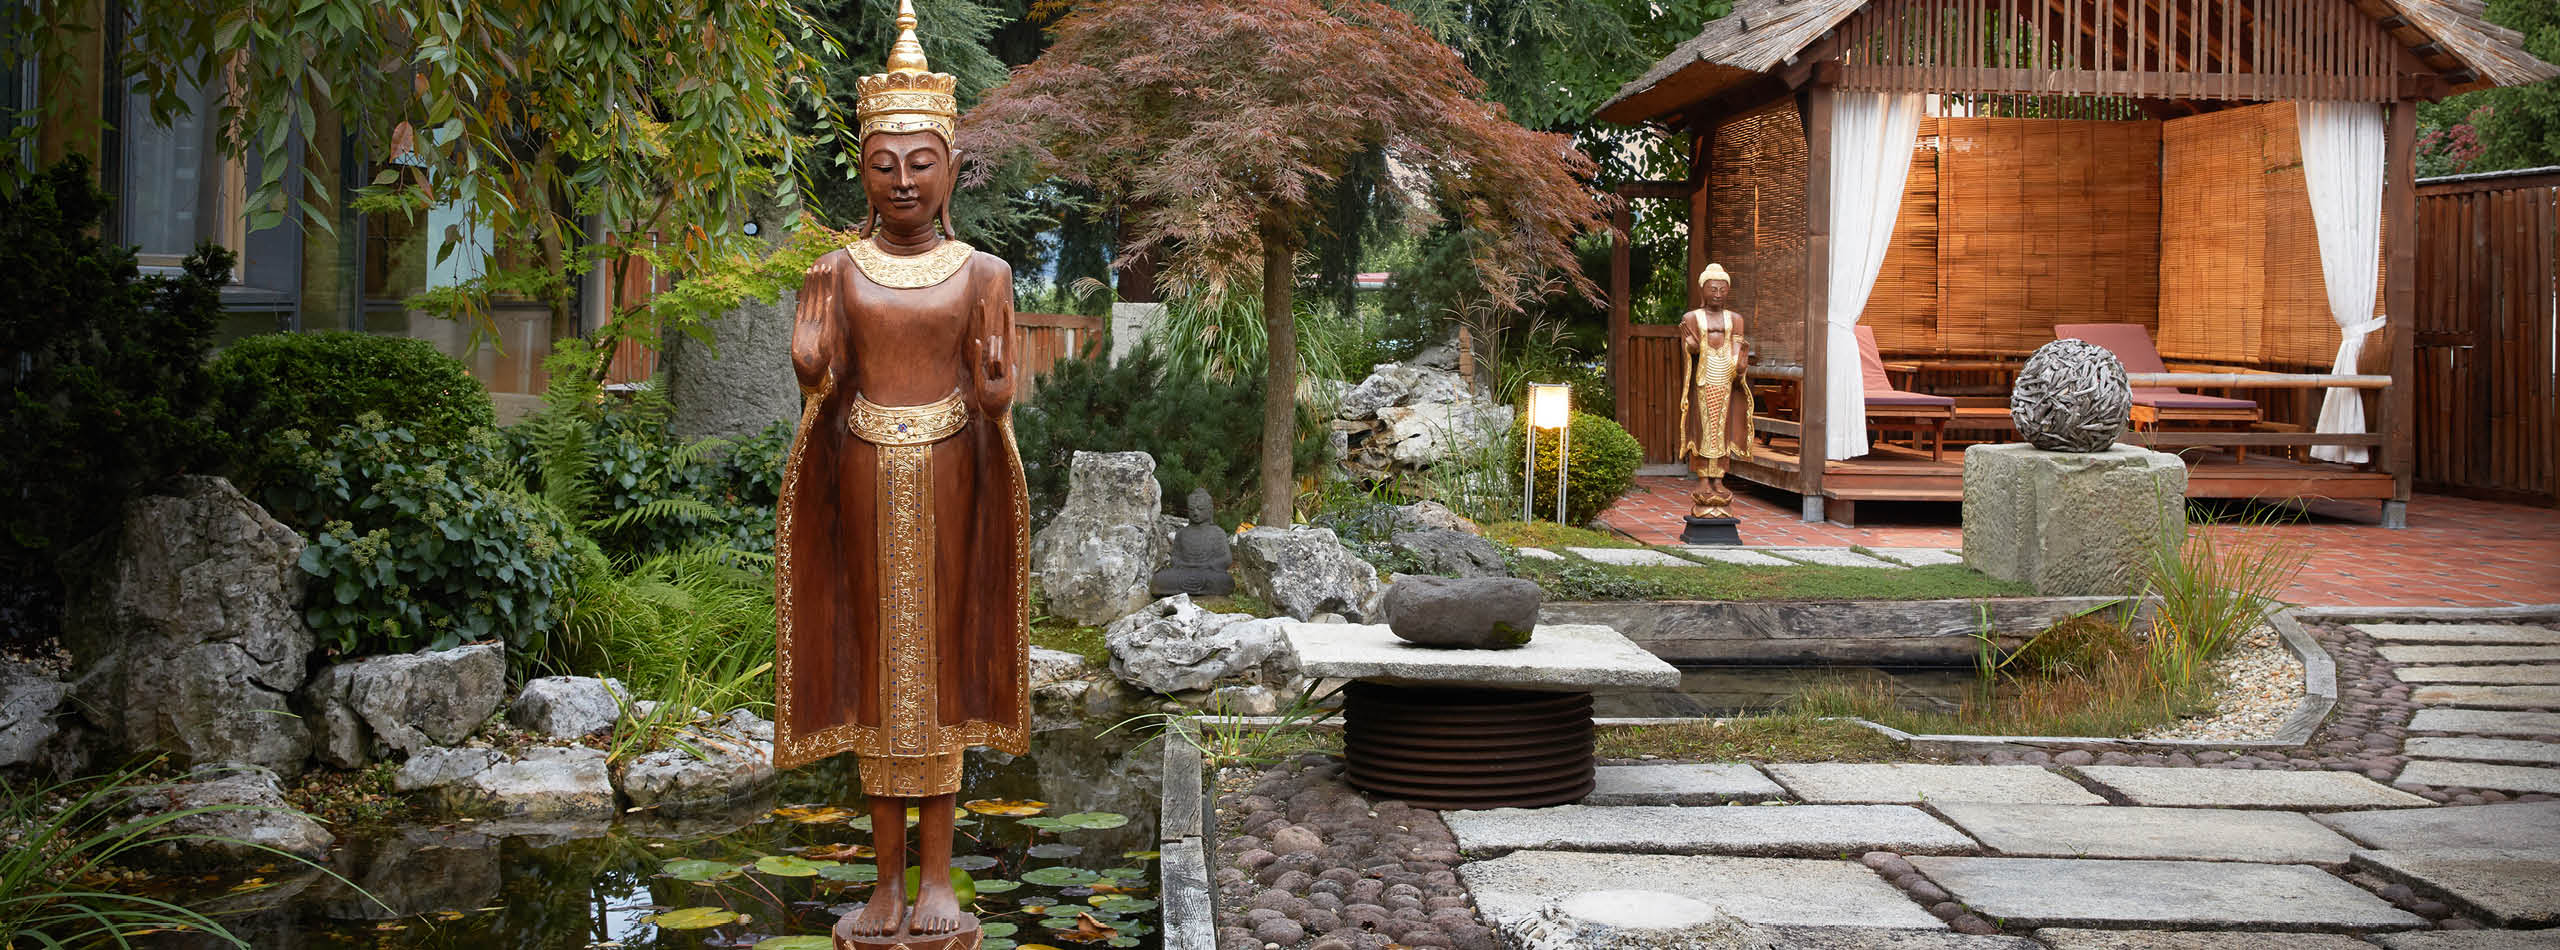 Ganeshas Garden Ayurveda Resort Mandira Bad Waltersdorf Steiermark